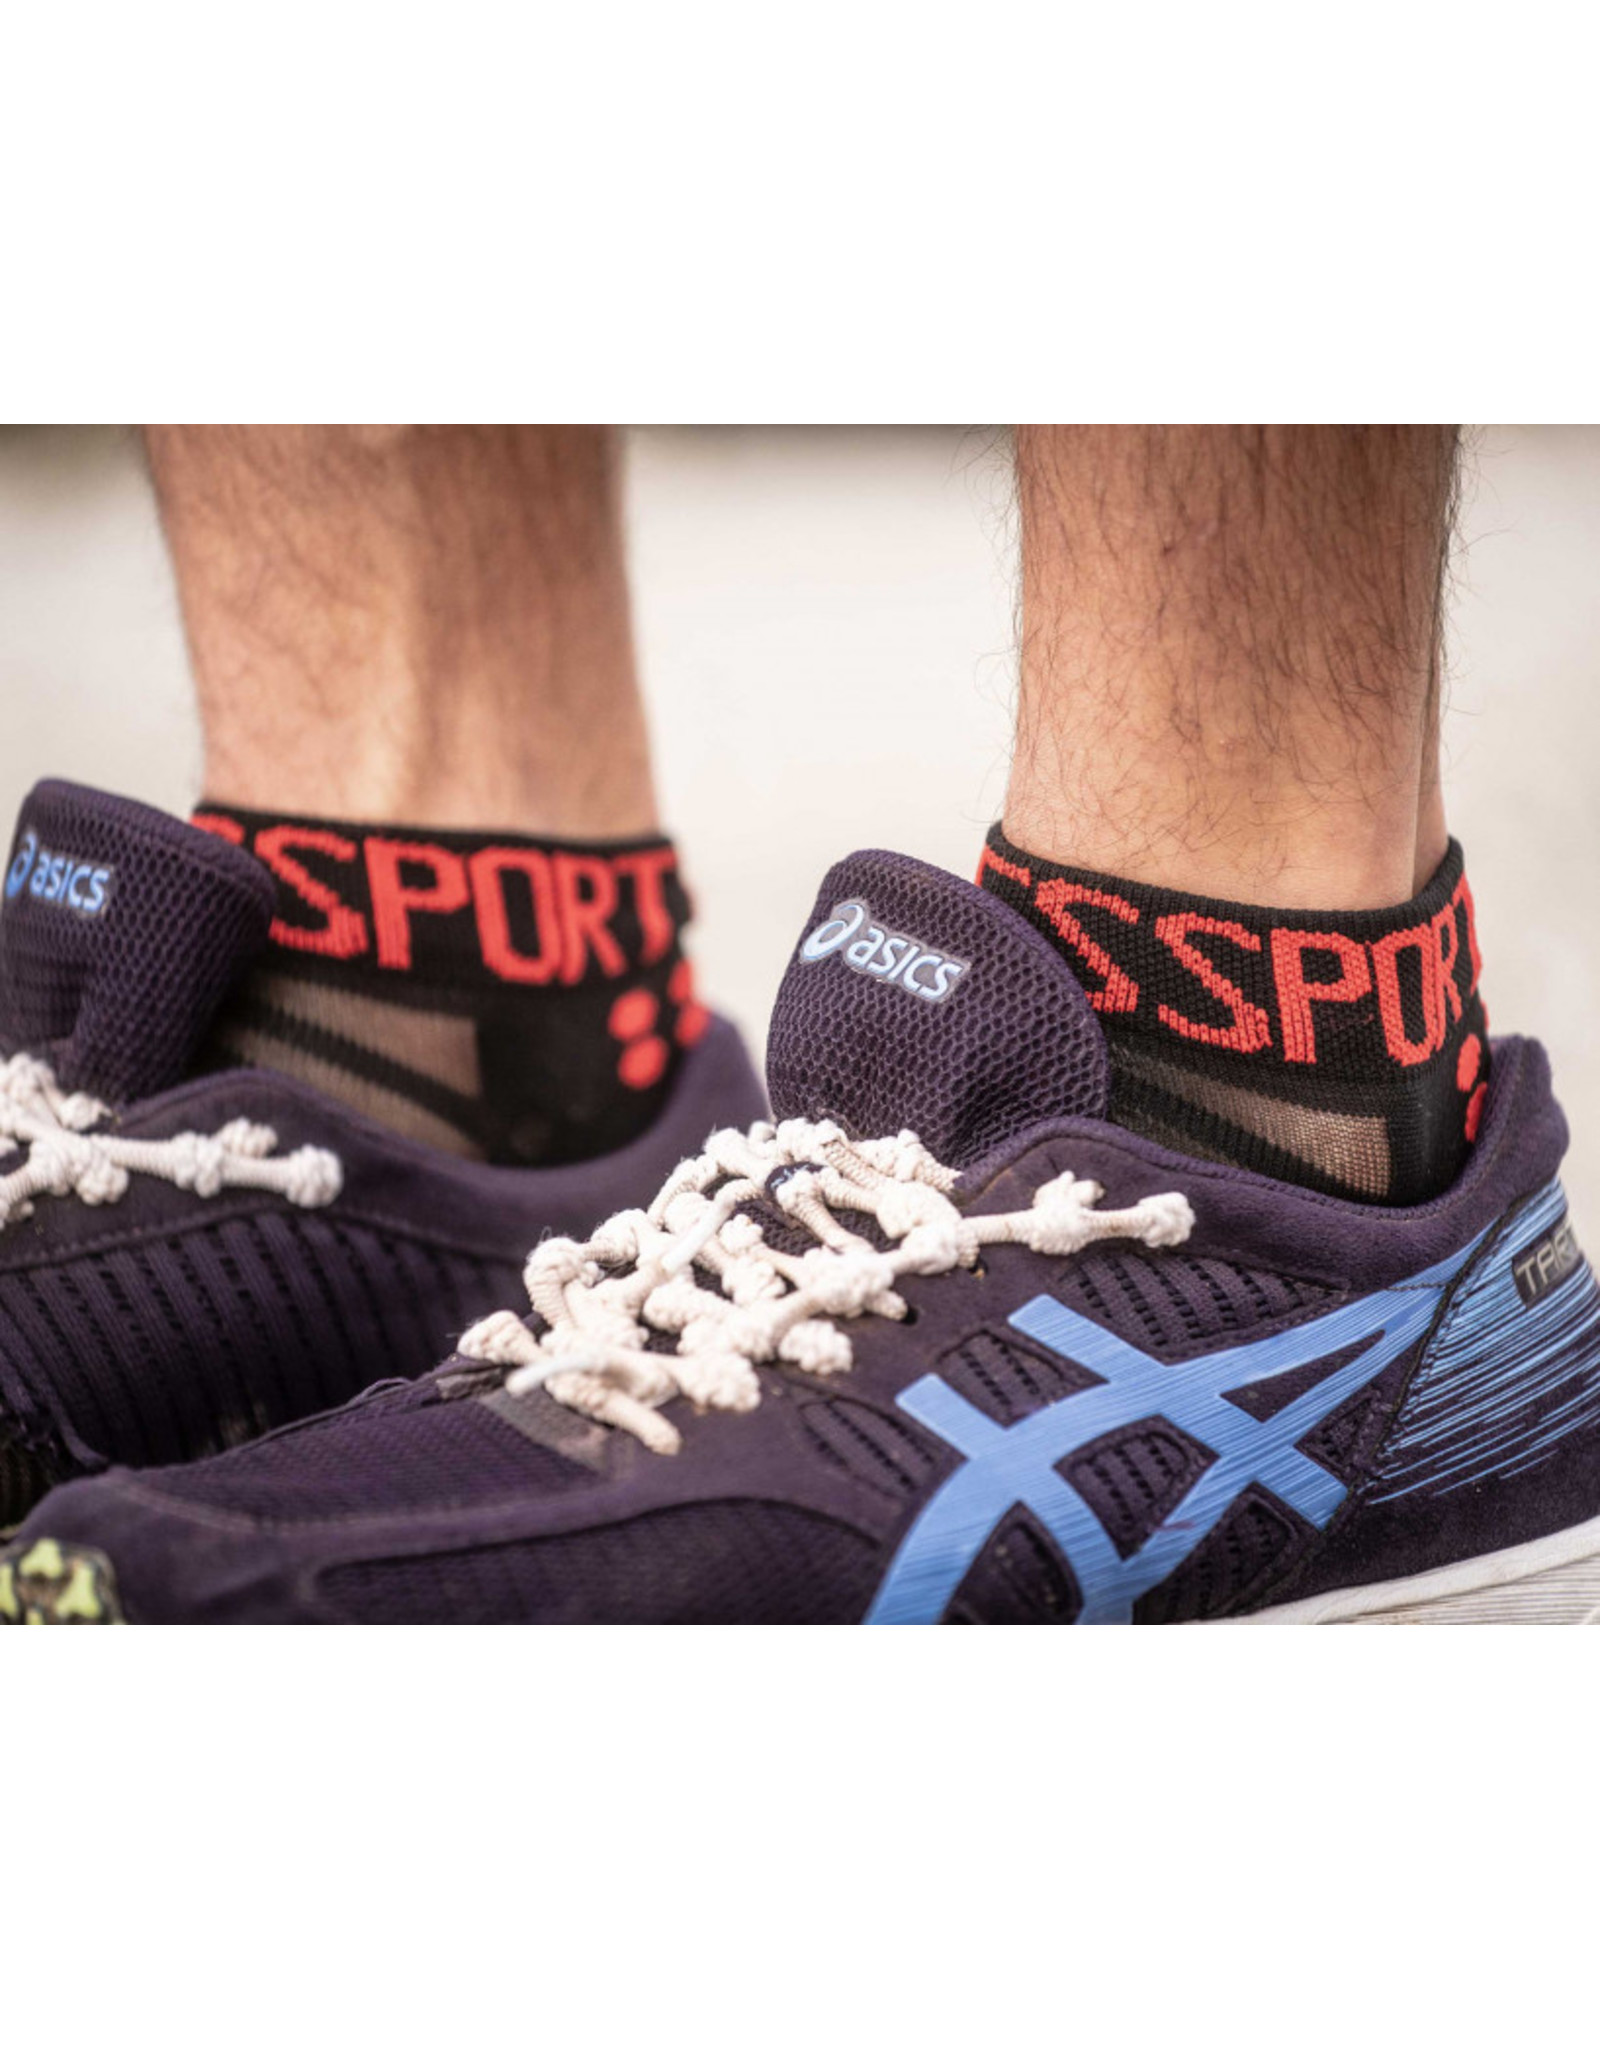 Compressport Pro Racing Socks V3.0 Ultralight Run Low Hardloopsokken - Zwart/Rood